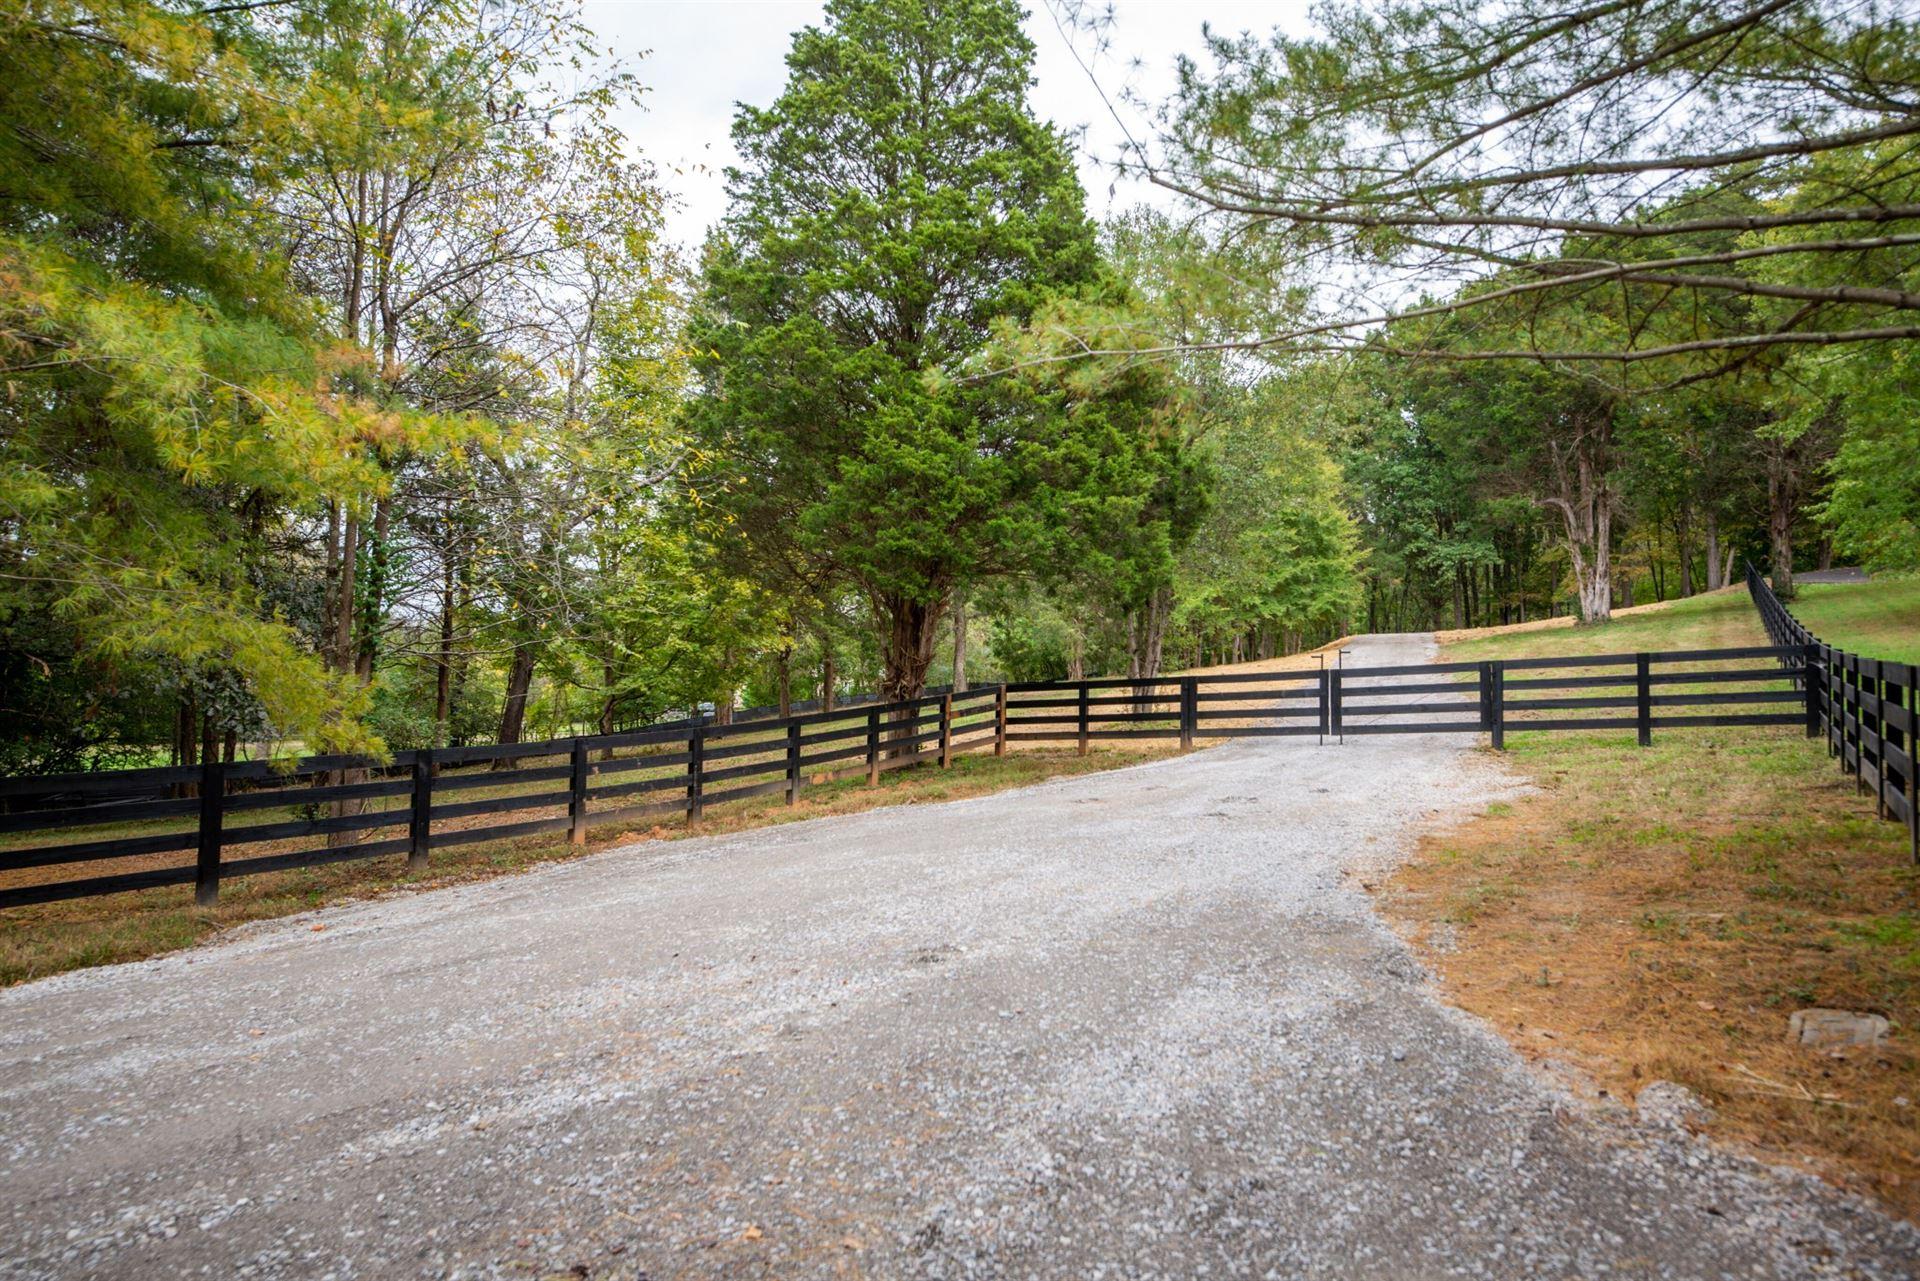 Photo of 915 Edmondson Pike, Brentwood, TN 37027 (MLS # 2301274)